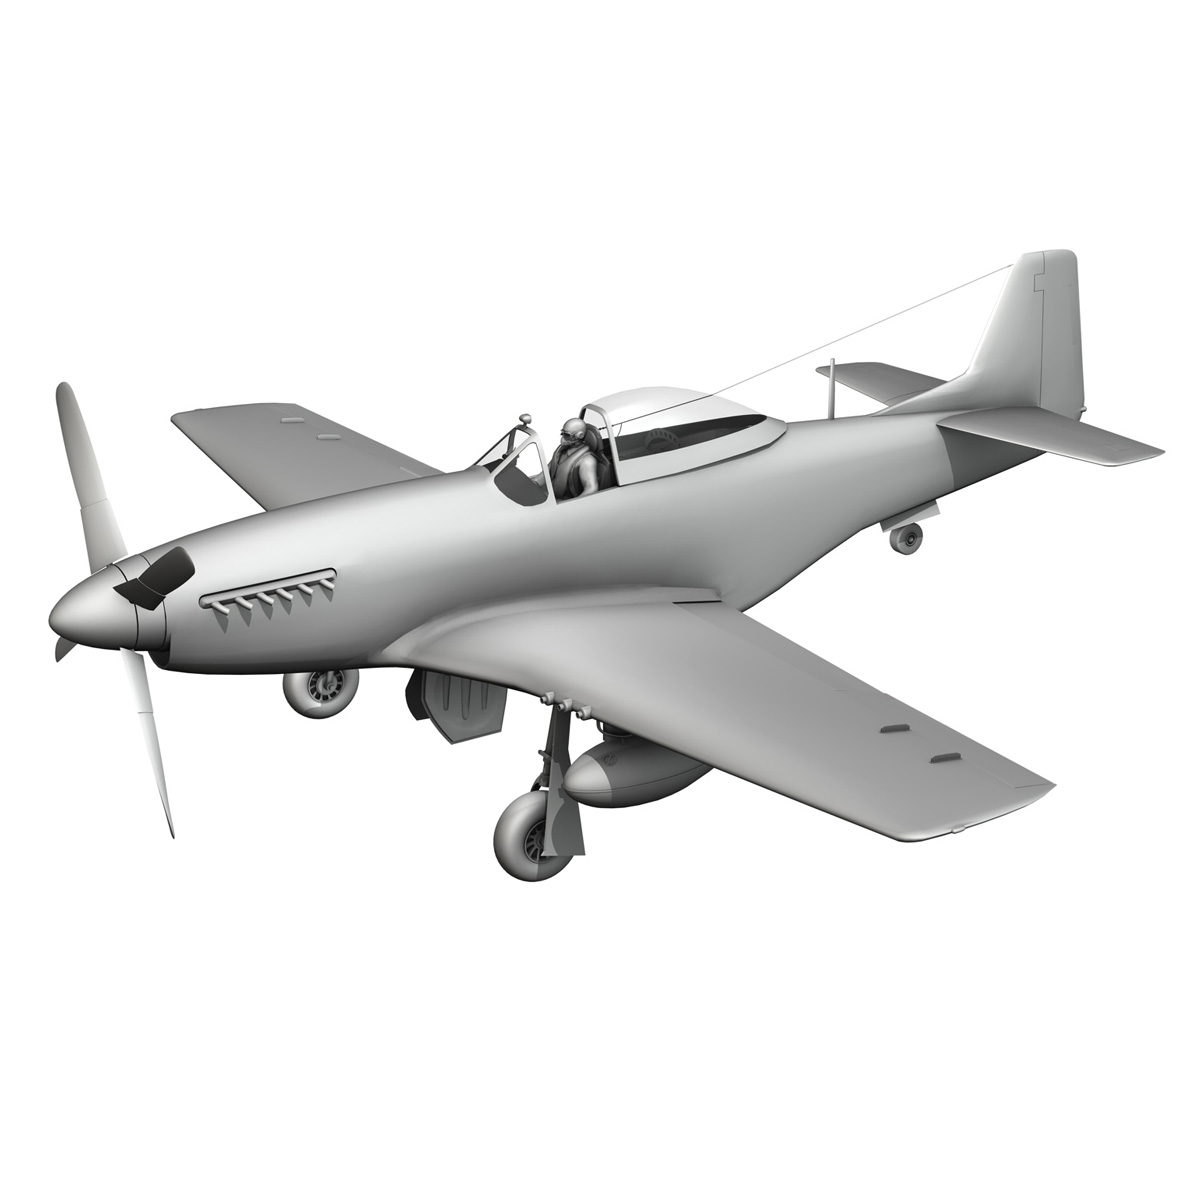 north american p-51d mustang – old crow 3d model fbx c4d lwo obj 273350